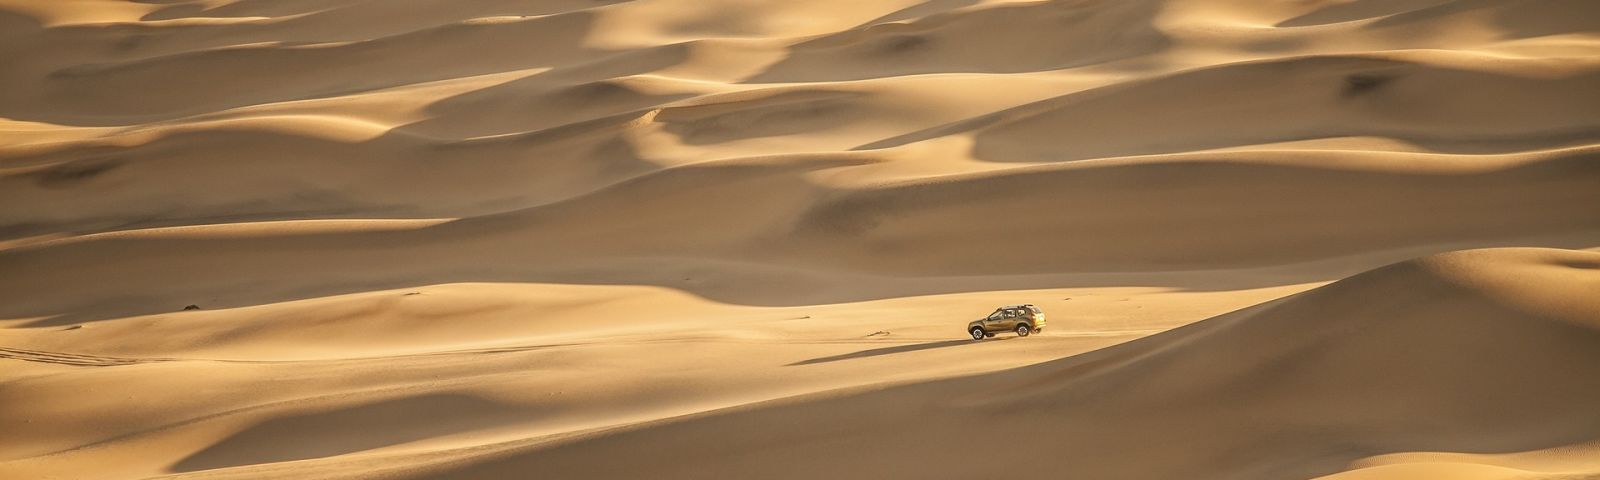 Enchanting Travels - Namibia Reisen - Jeep - Wüstentour - Sanddünen